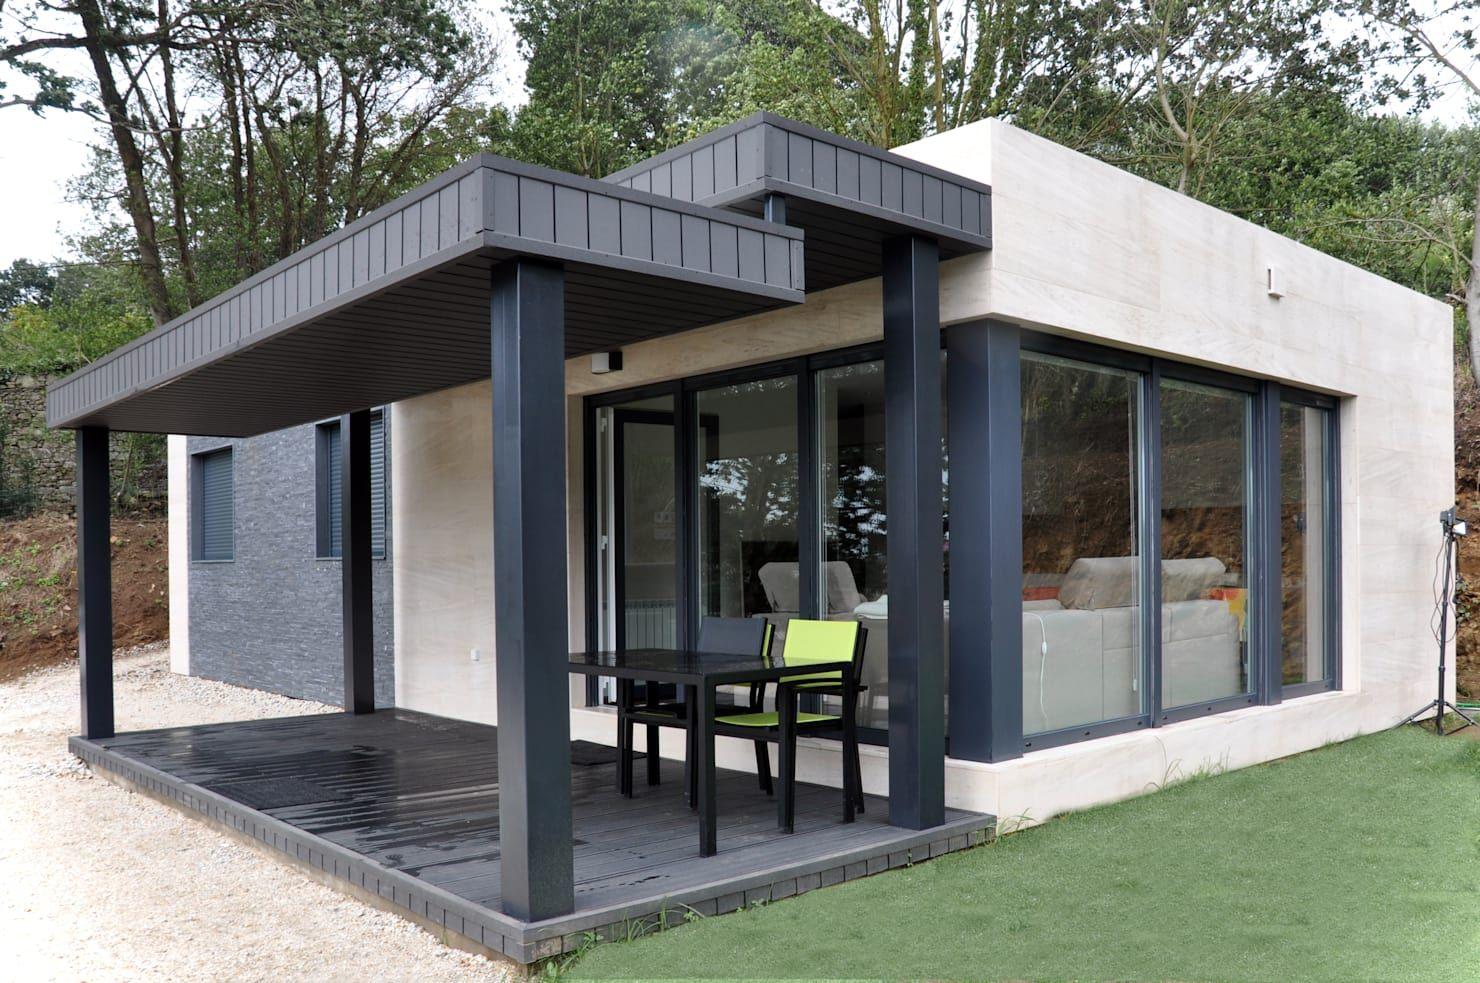 Modulares Haus mit 75 Quadratmetern unter 60000€ | Häuser ...